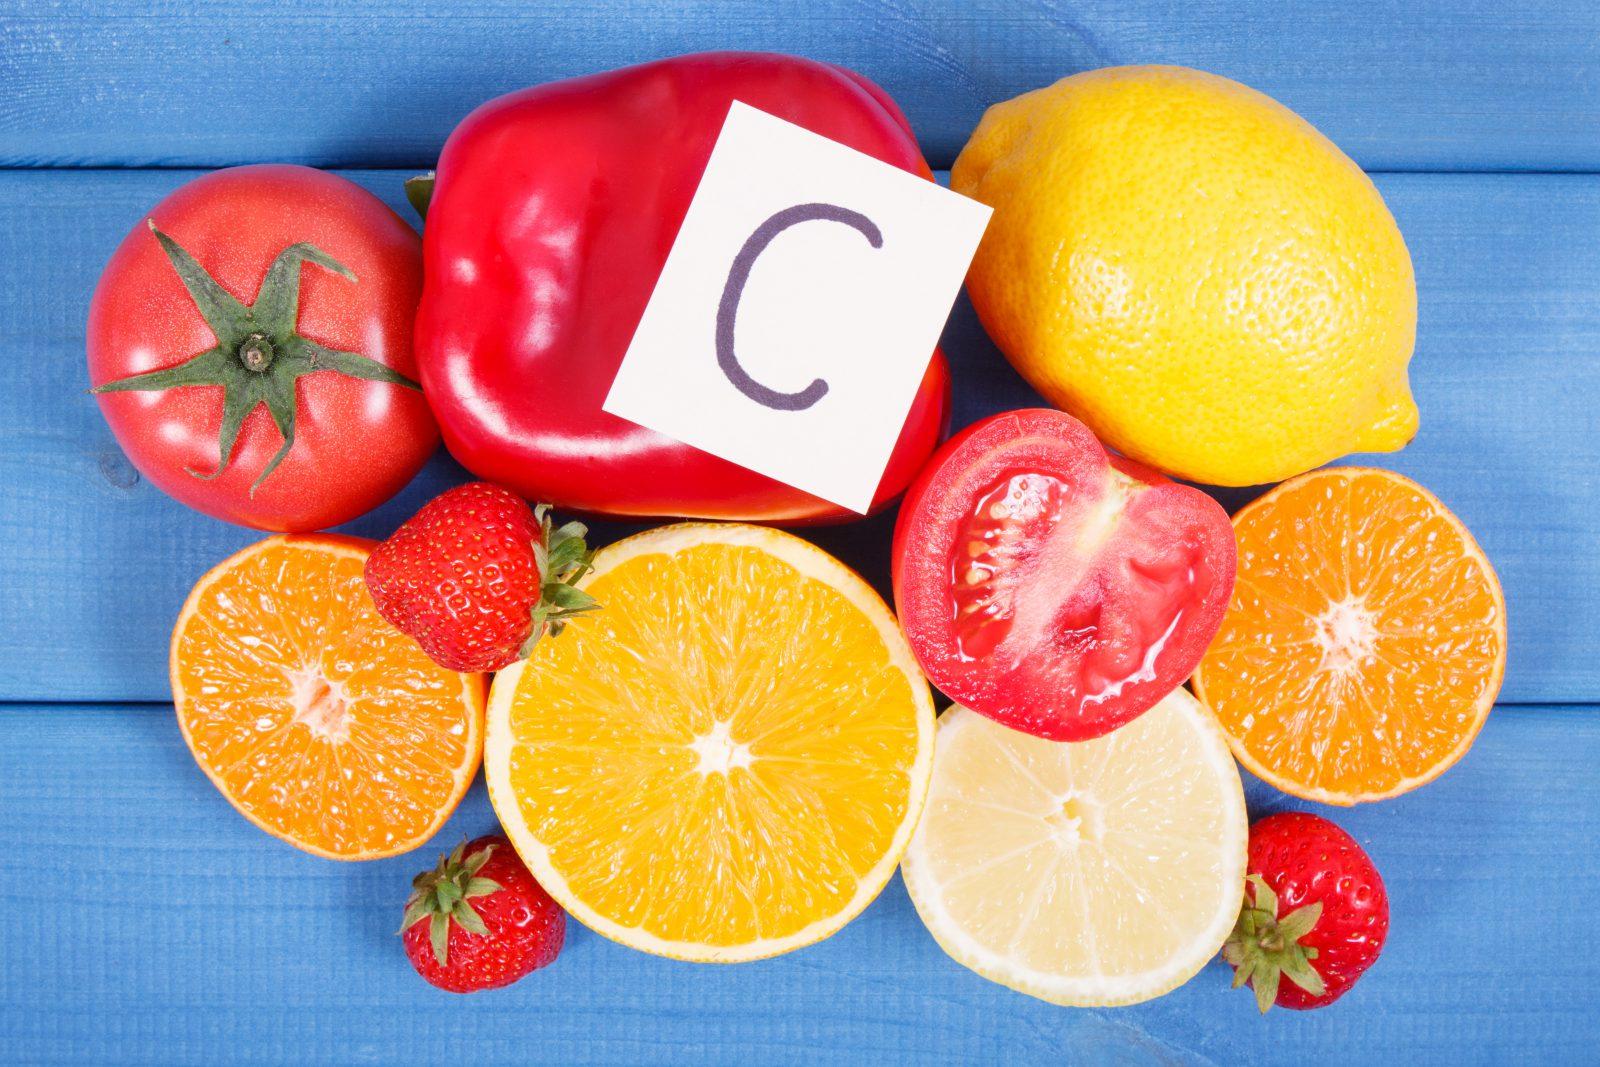 Vitamina para cachorro: Grupo de frutas e leguminosas que contém vitamina C